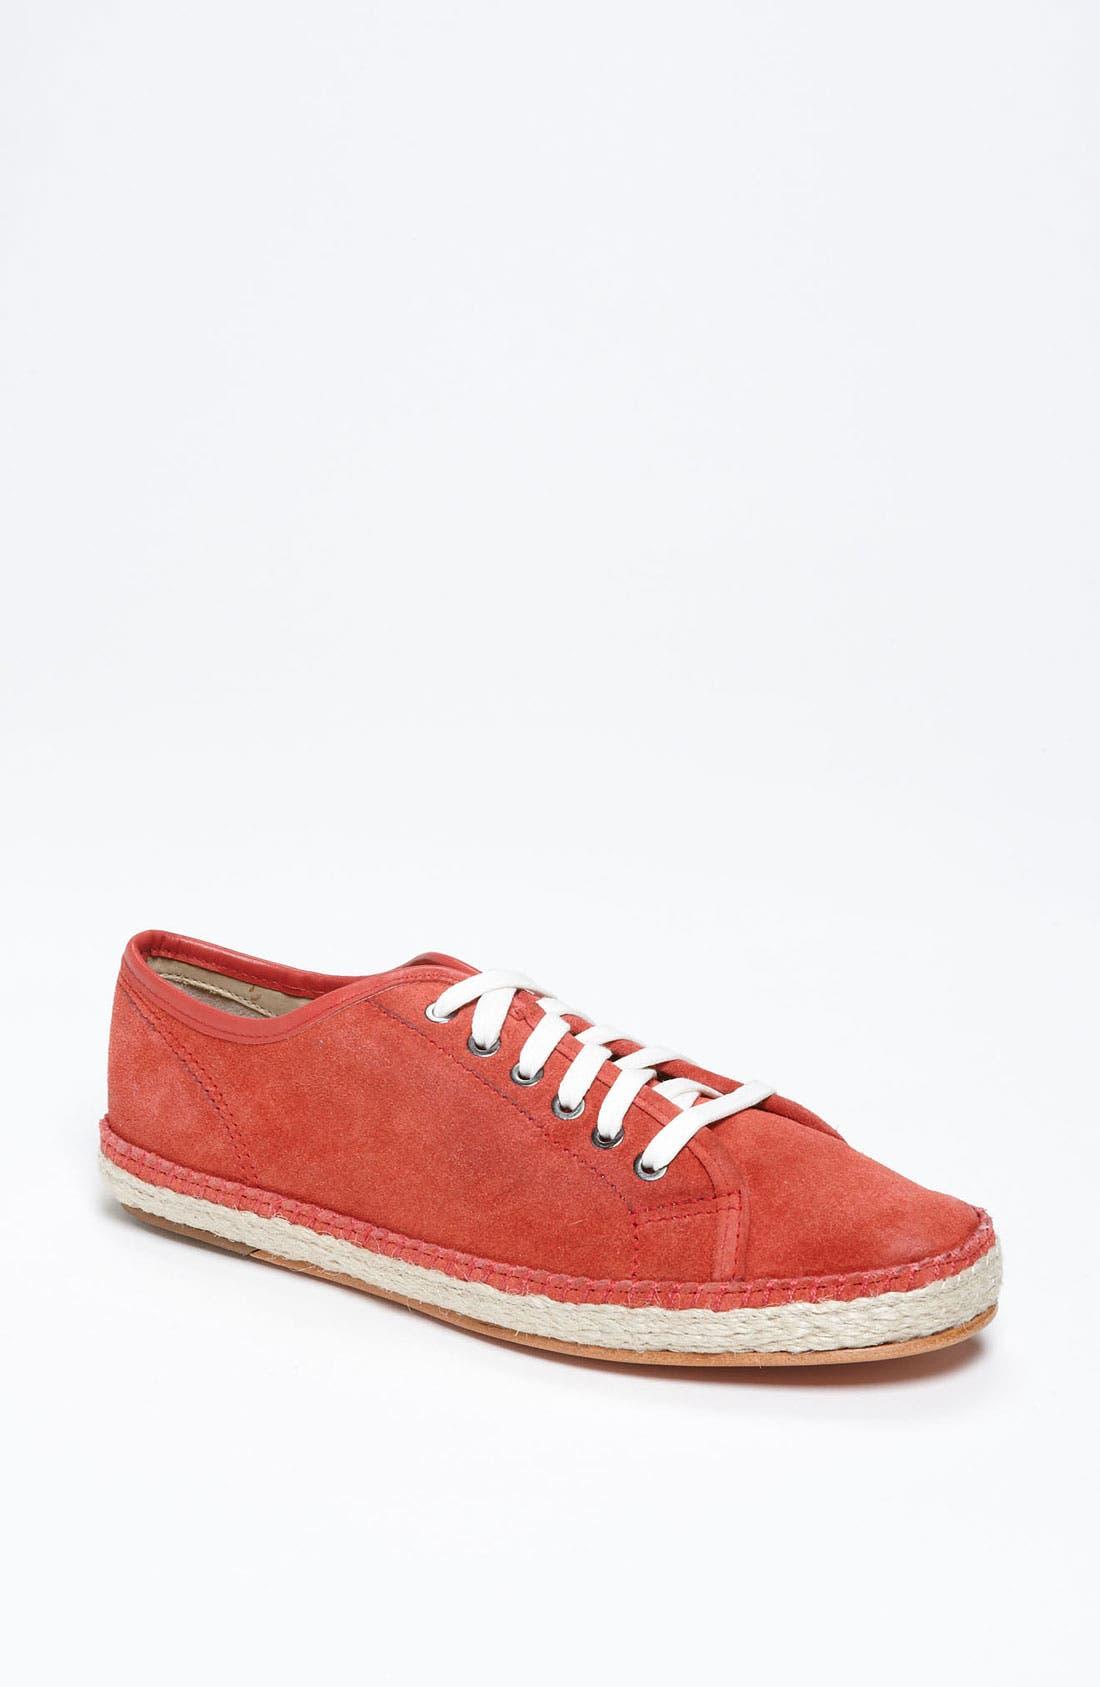 Main Image - rag & bone 'Baylor' Sneaker